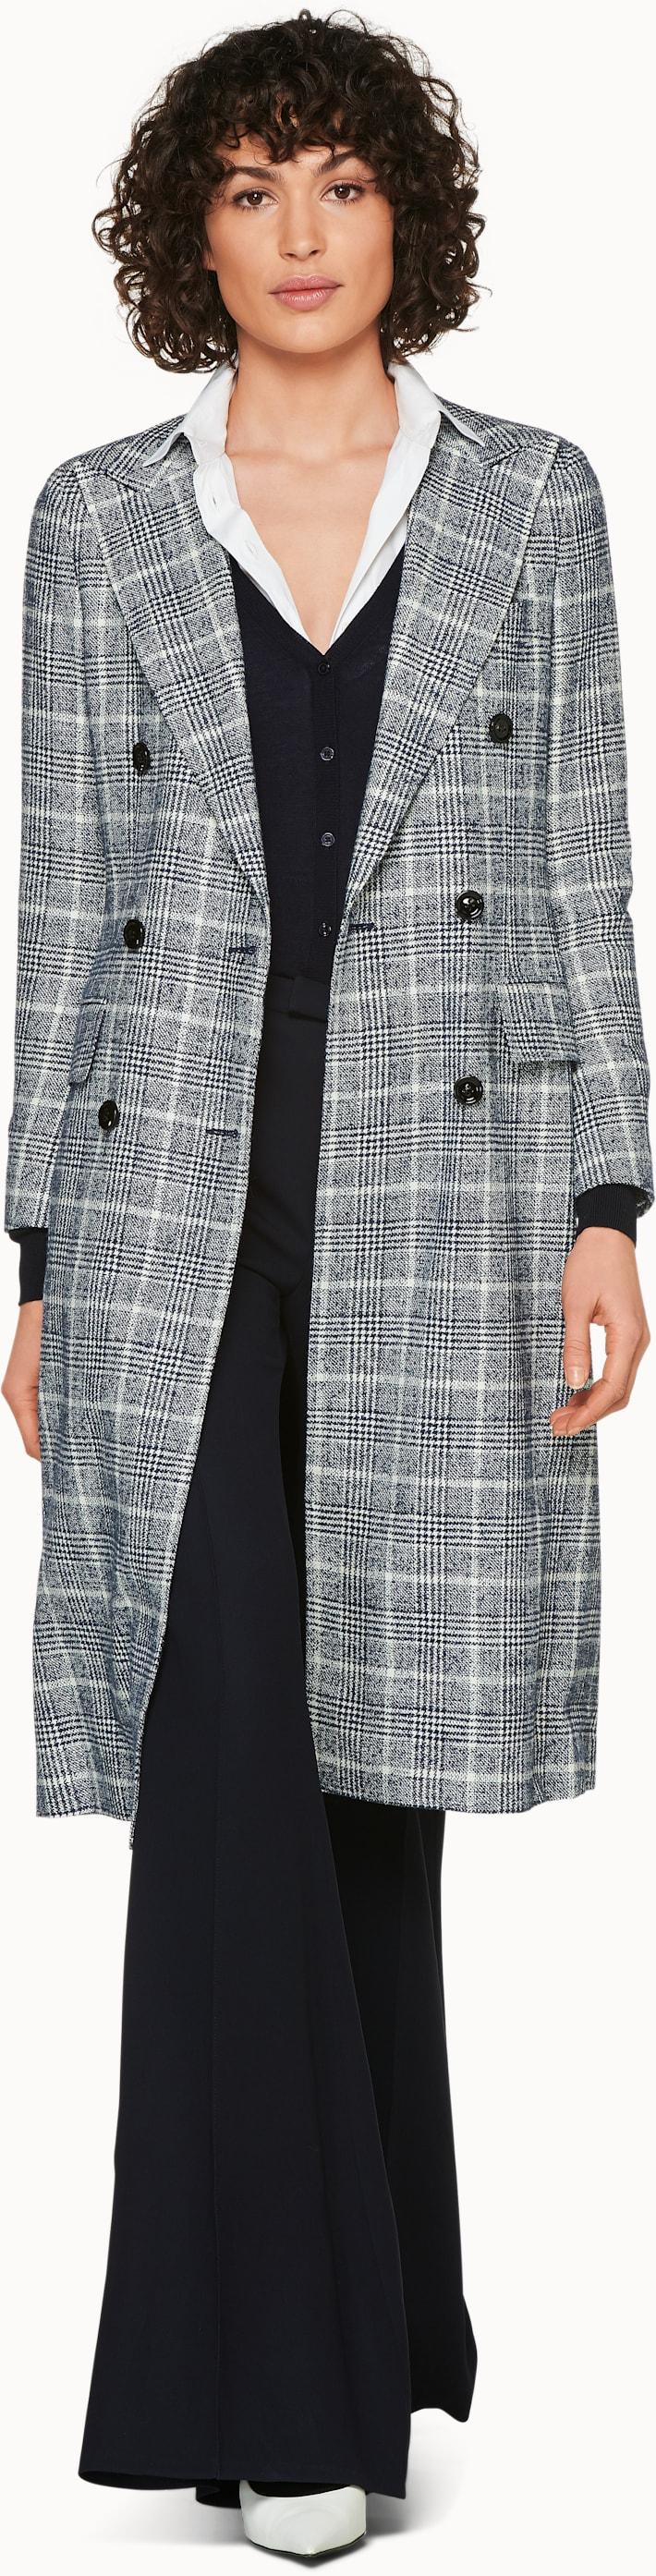 Brian Blue Checked Coat